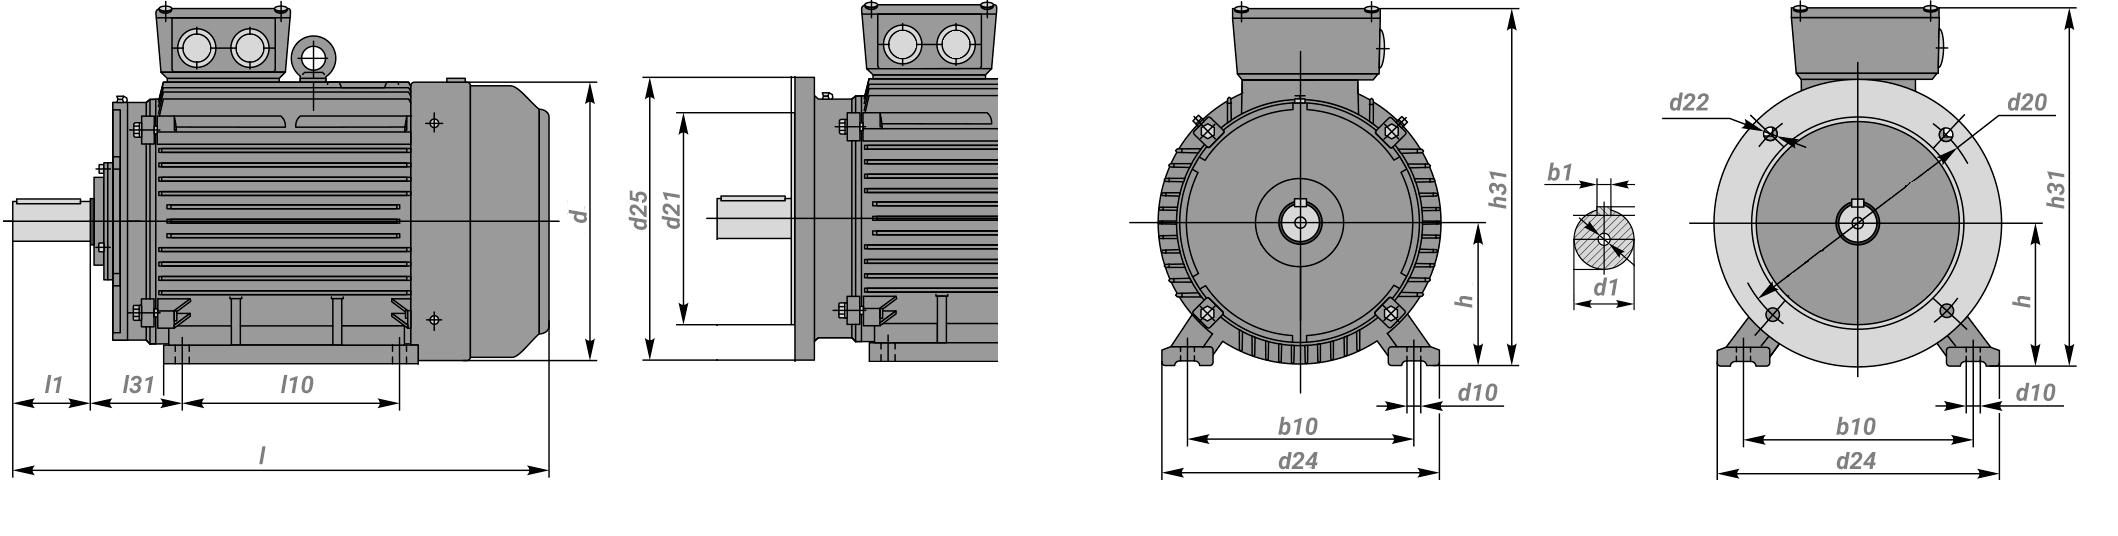 габаритные размеры электродвигателей 4А250s2, 4АМ250s2, 5АМ250s2 длина вала